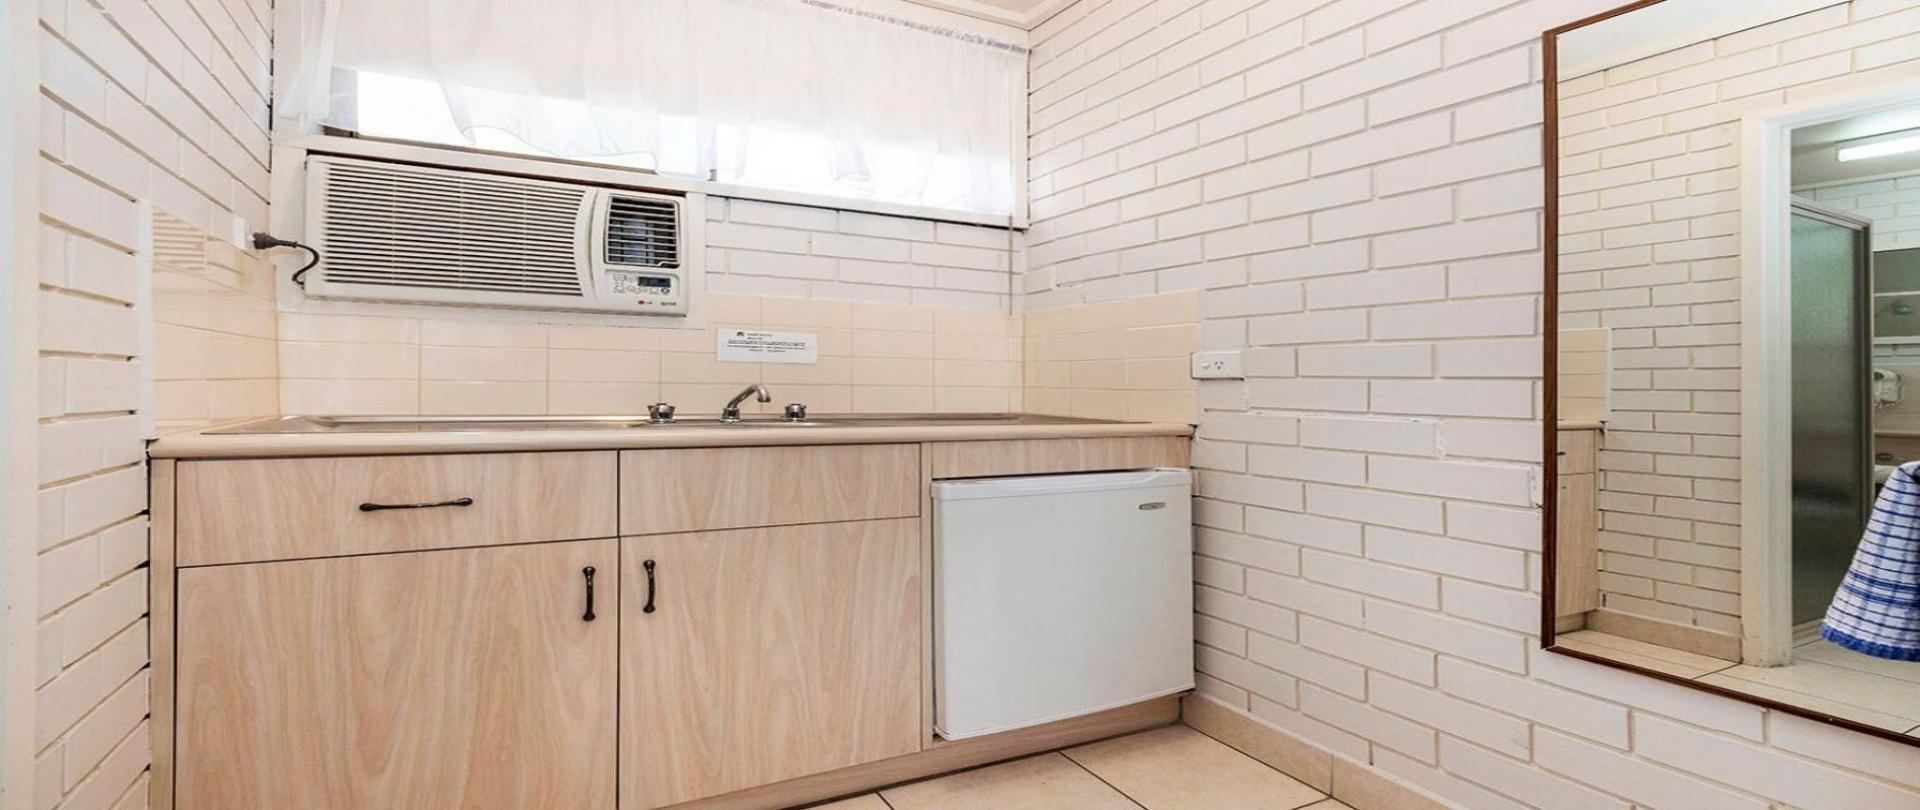 kitchenett.jpg